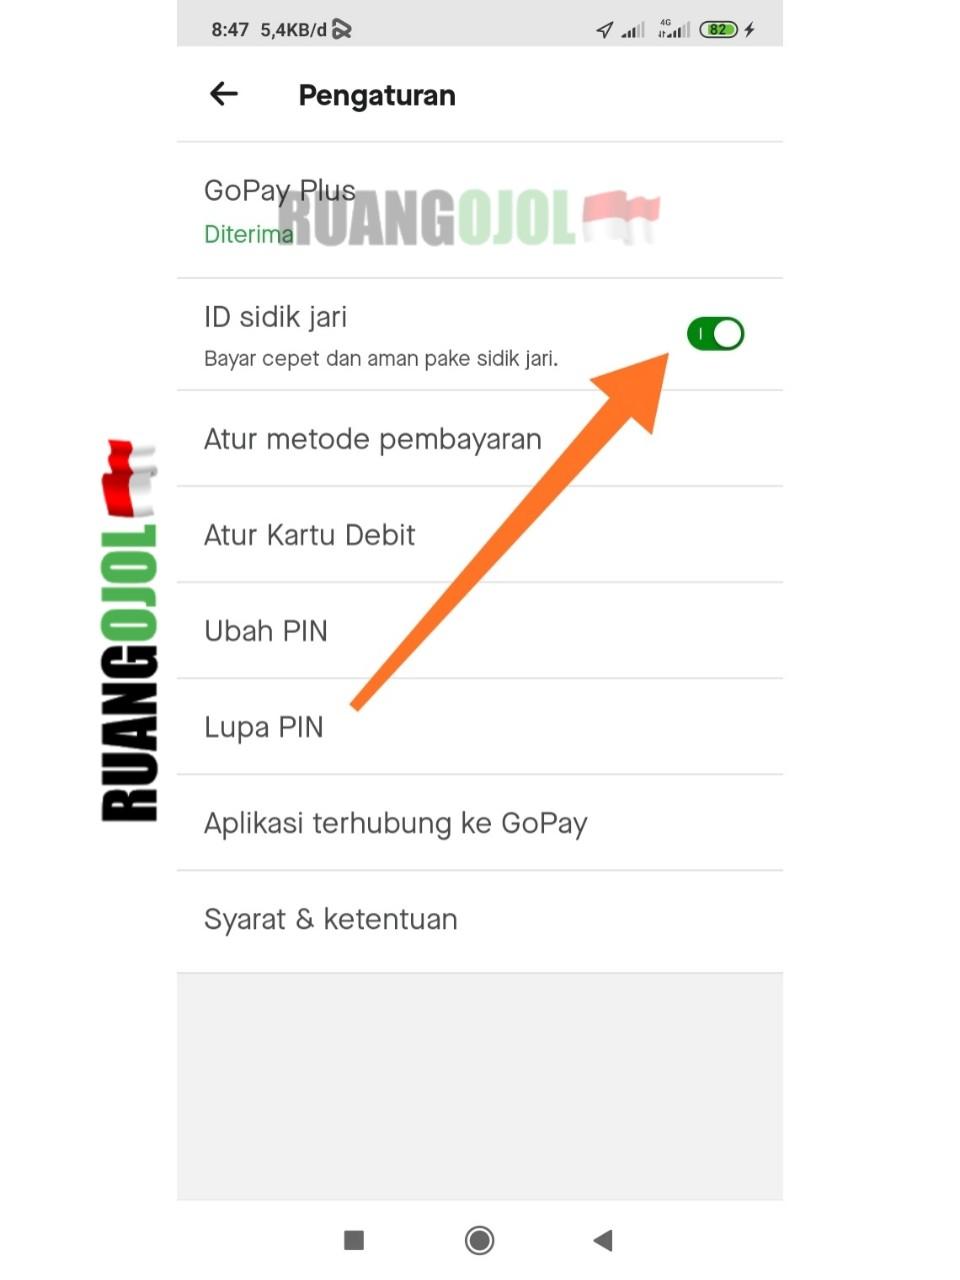 Cara Mengaktifkan ID Sidik Jari Gojek Untuk Pembayaran Mudah dan Cepat!